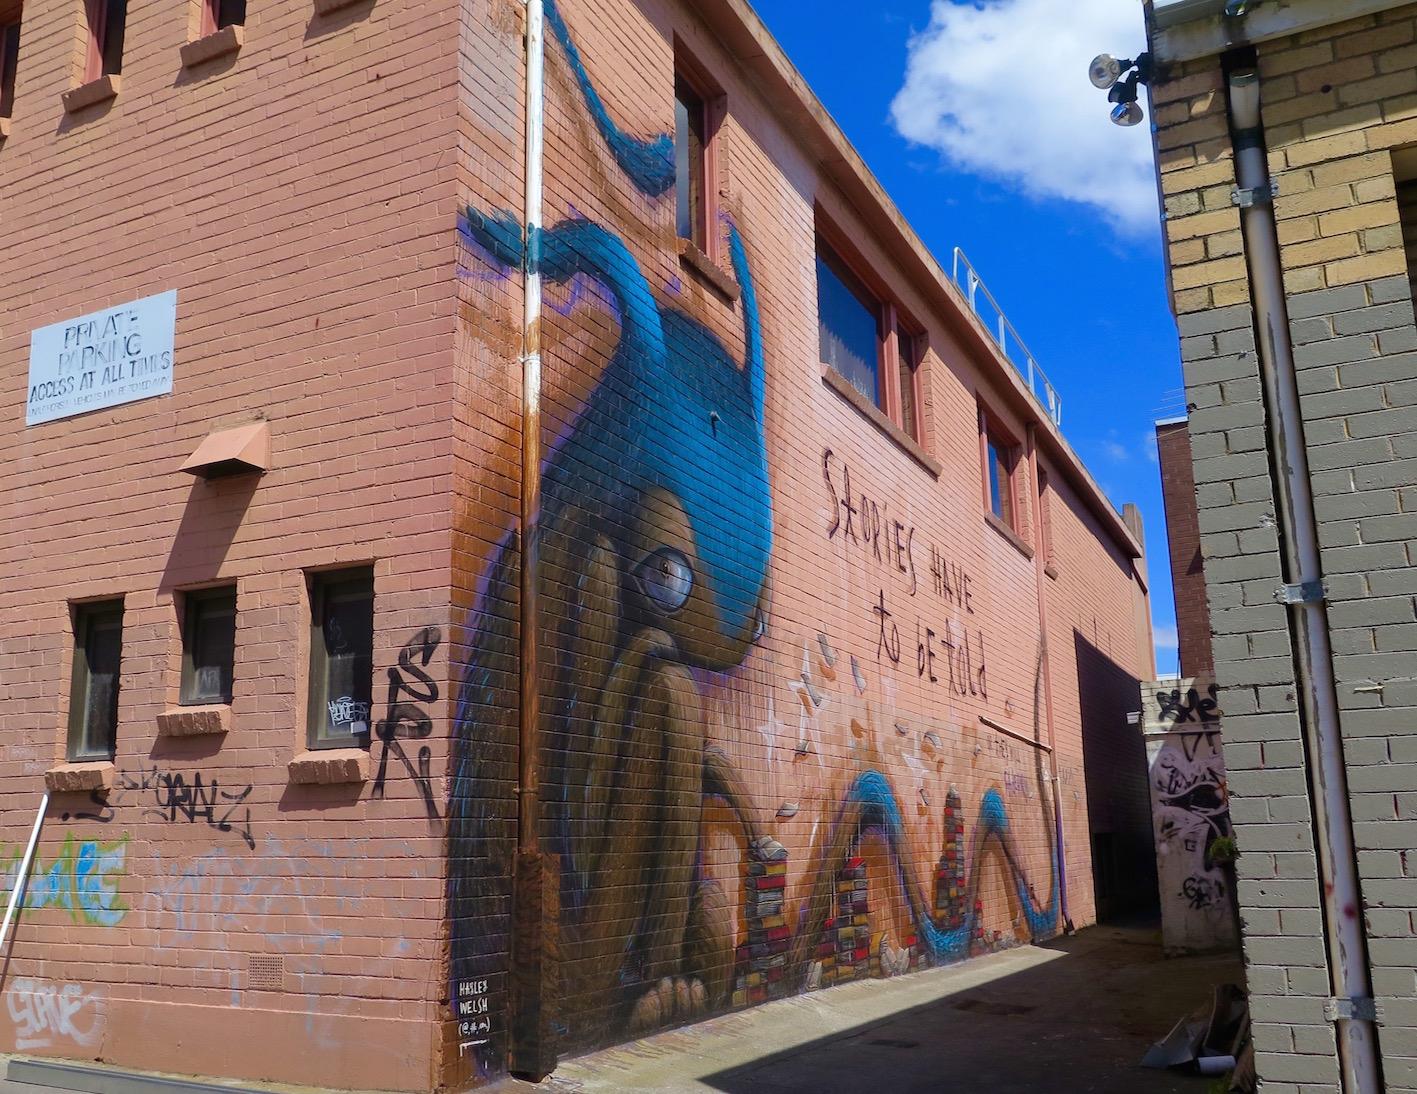 deansunshine_landofsunshine_melbourne_streetart_graffiti_eastland urban art project 12 hayley welsh 1